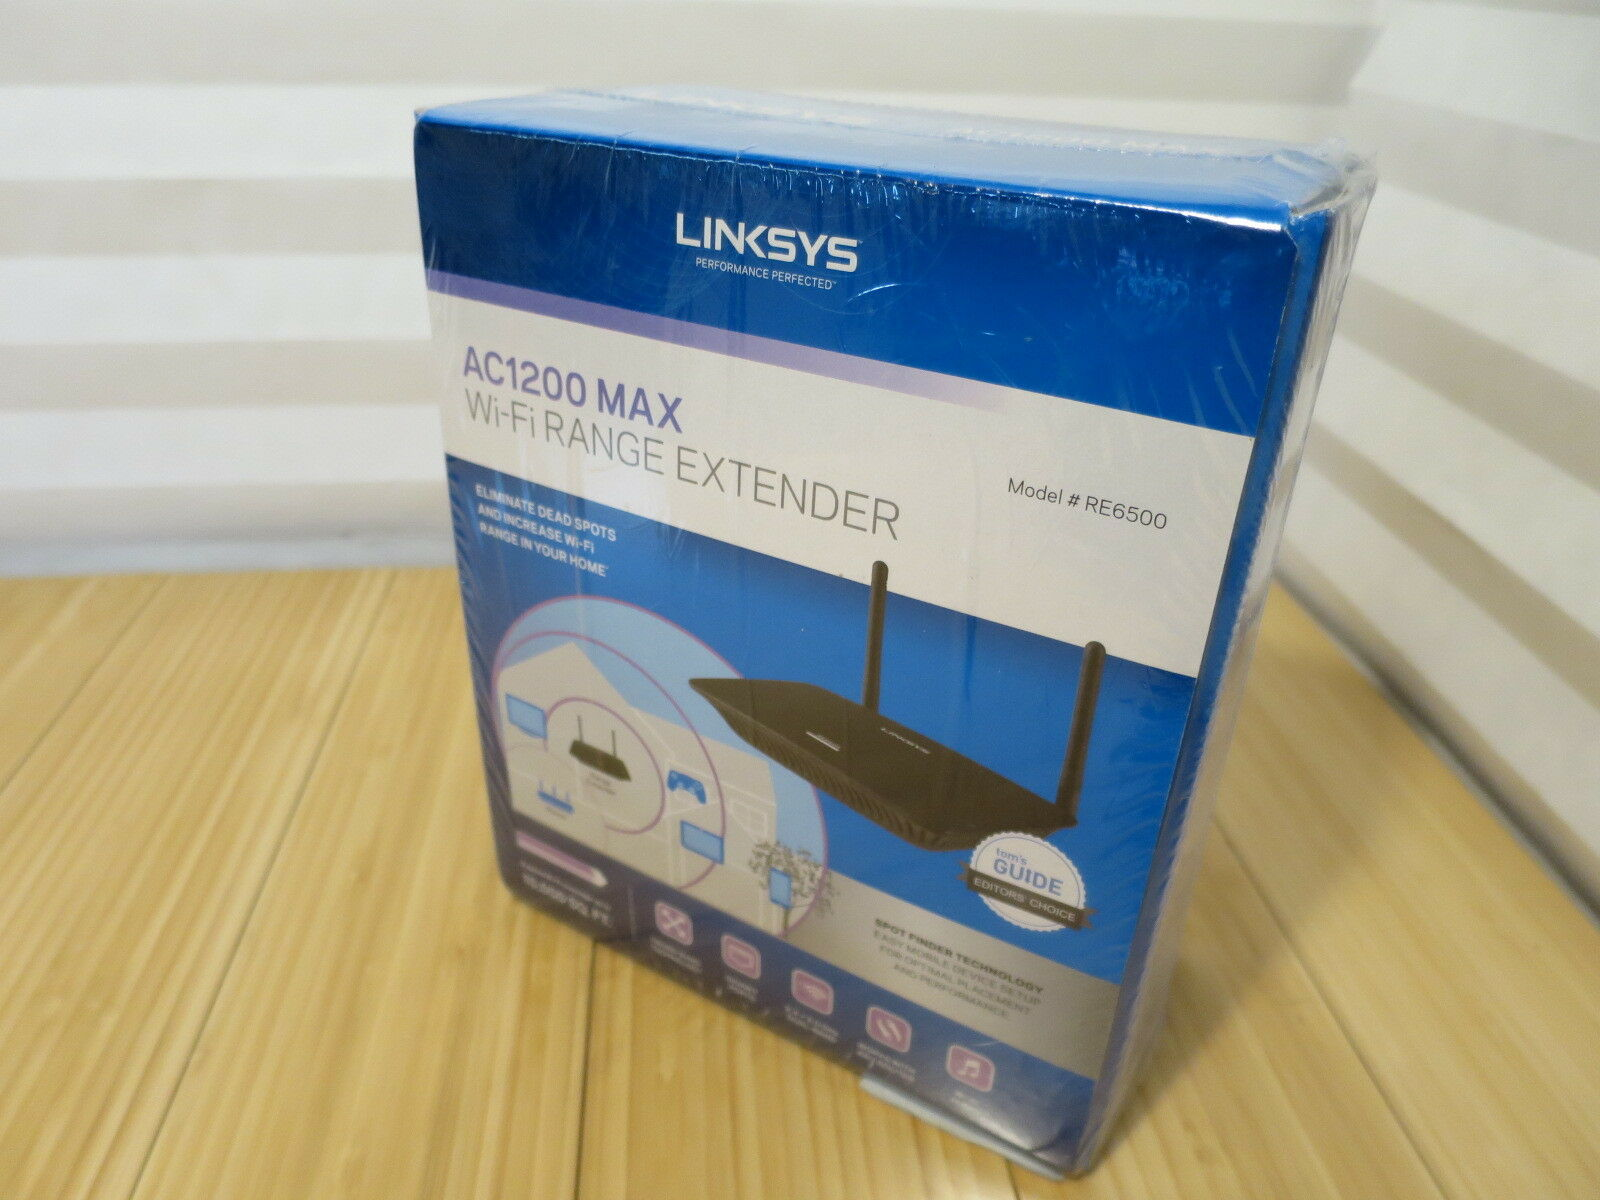 Linksys AC1200 MAX Wi-Fi Gigabit Range Extender & Repeater